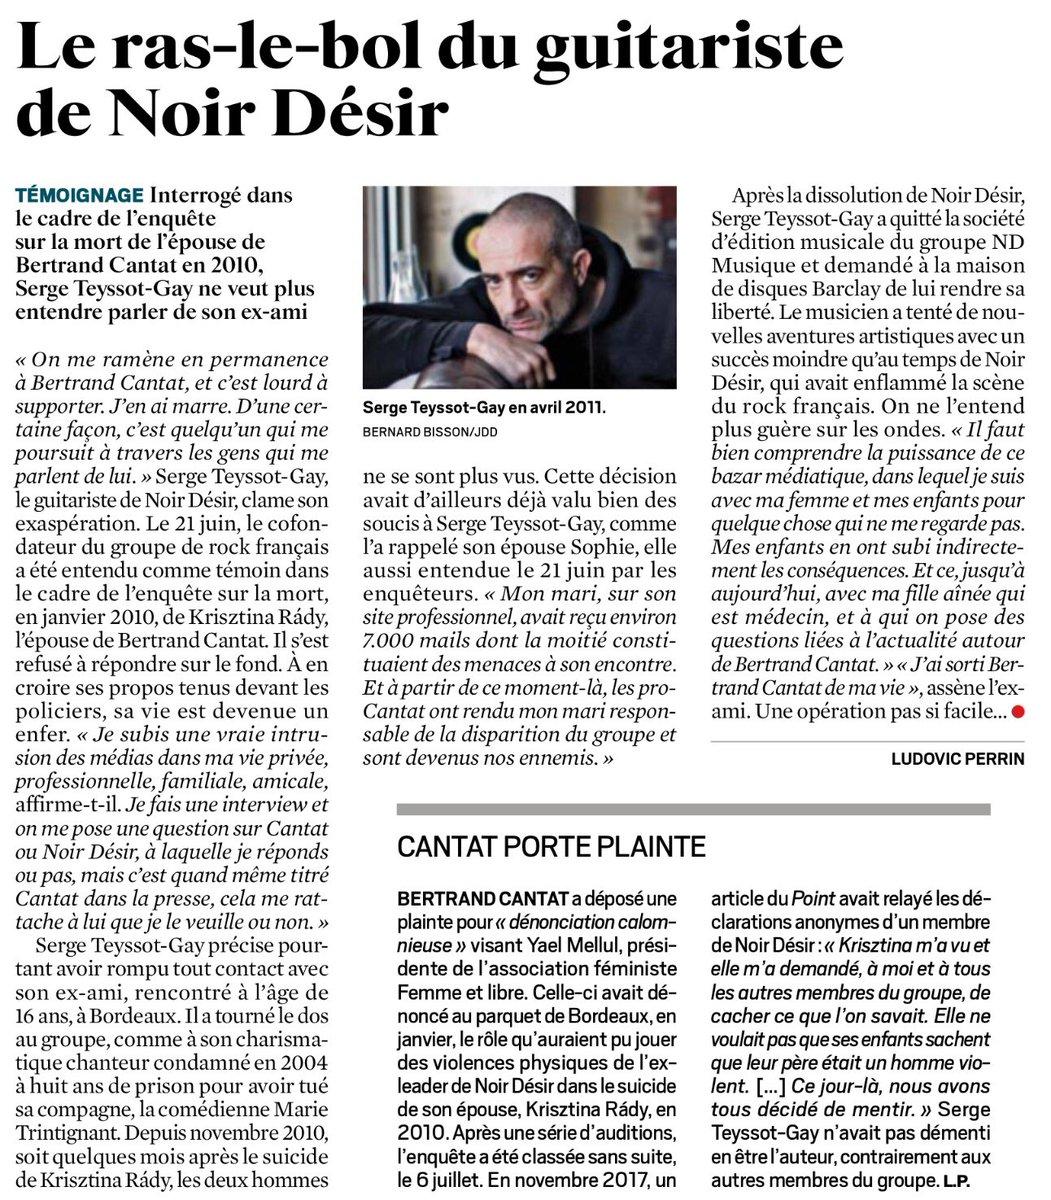 Le ras-le-bol de Serge Teyssot-Gay, ancien guitariste de Noir Désir #Cantatin #JDD  - FestivalFocus